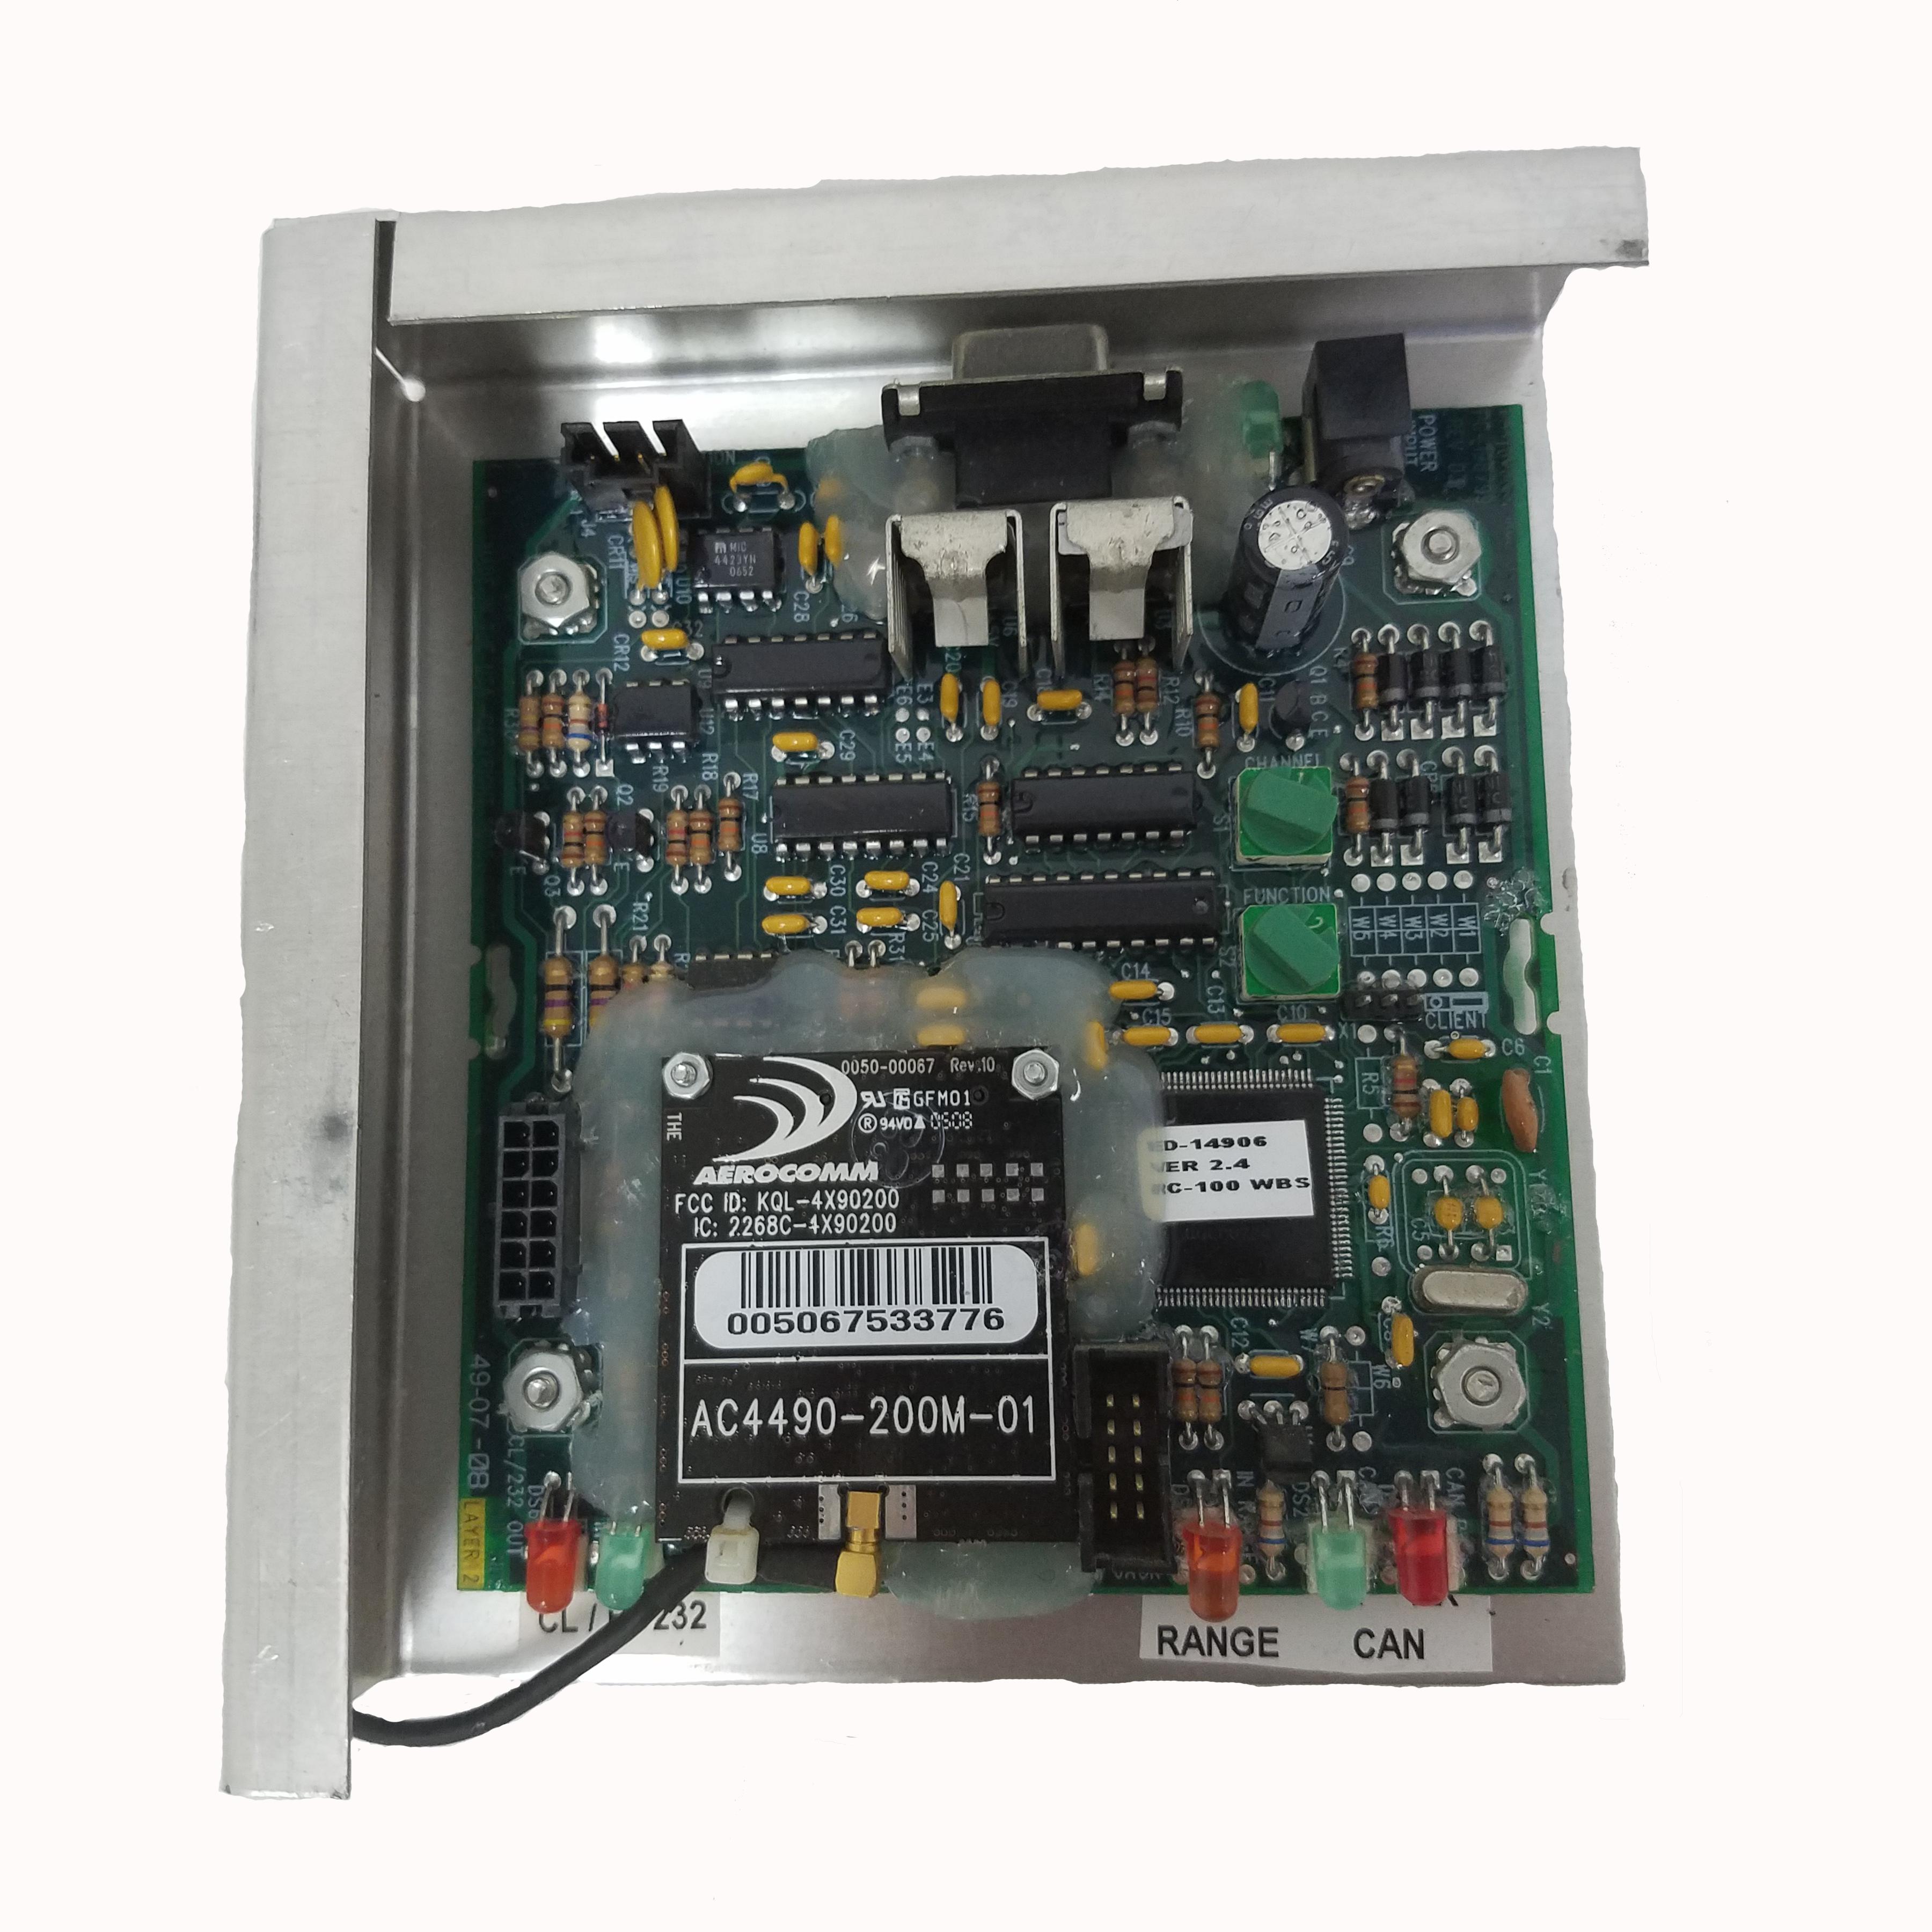 Daktronics-0A-1110-0035-RC-100-Base-Station-Receiver